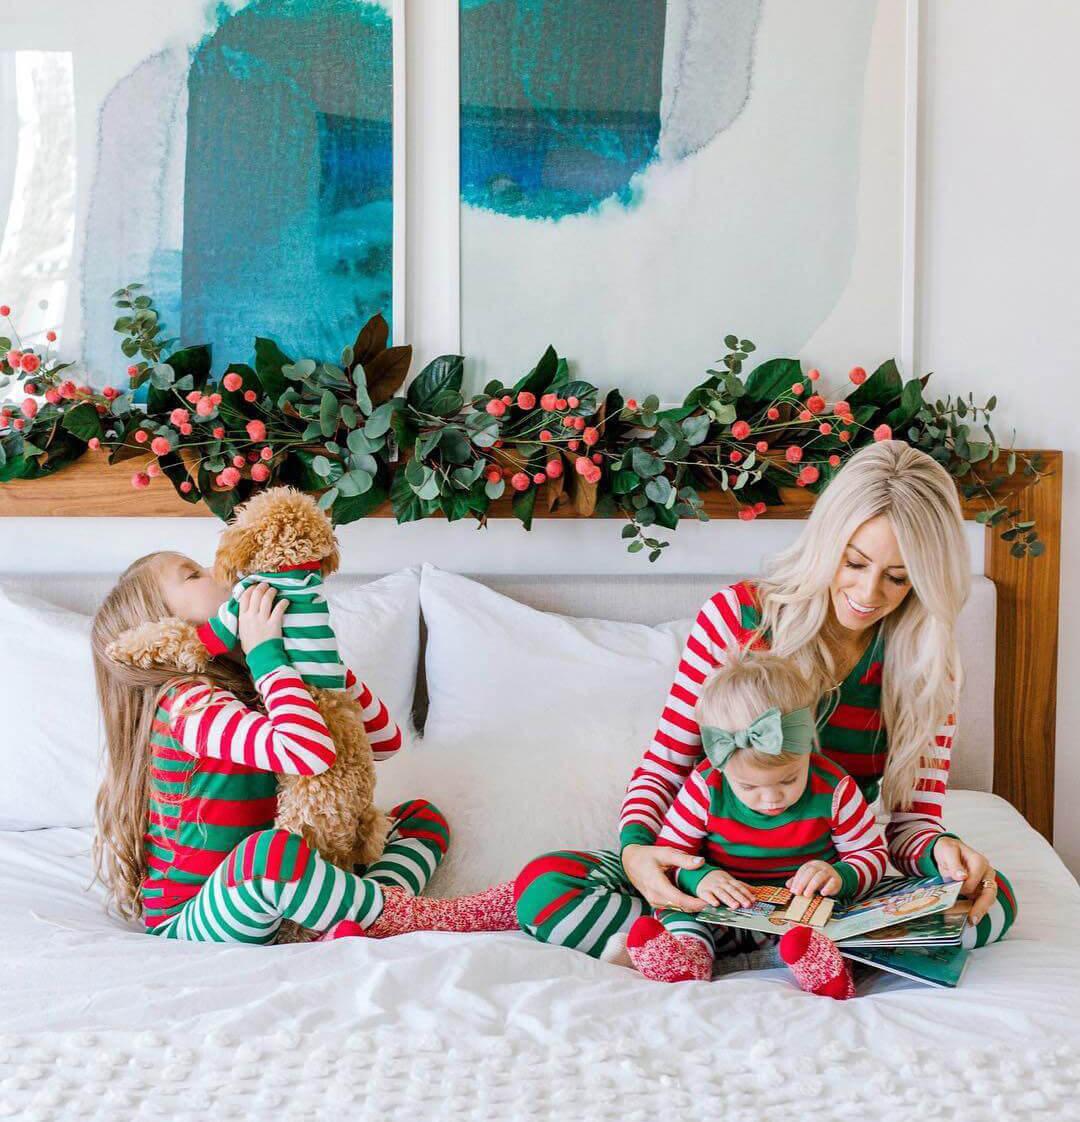 Family wearing holiday pajamas